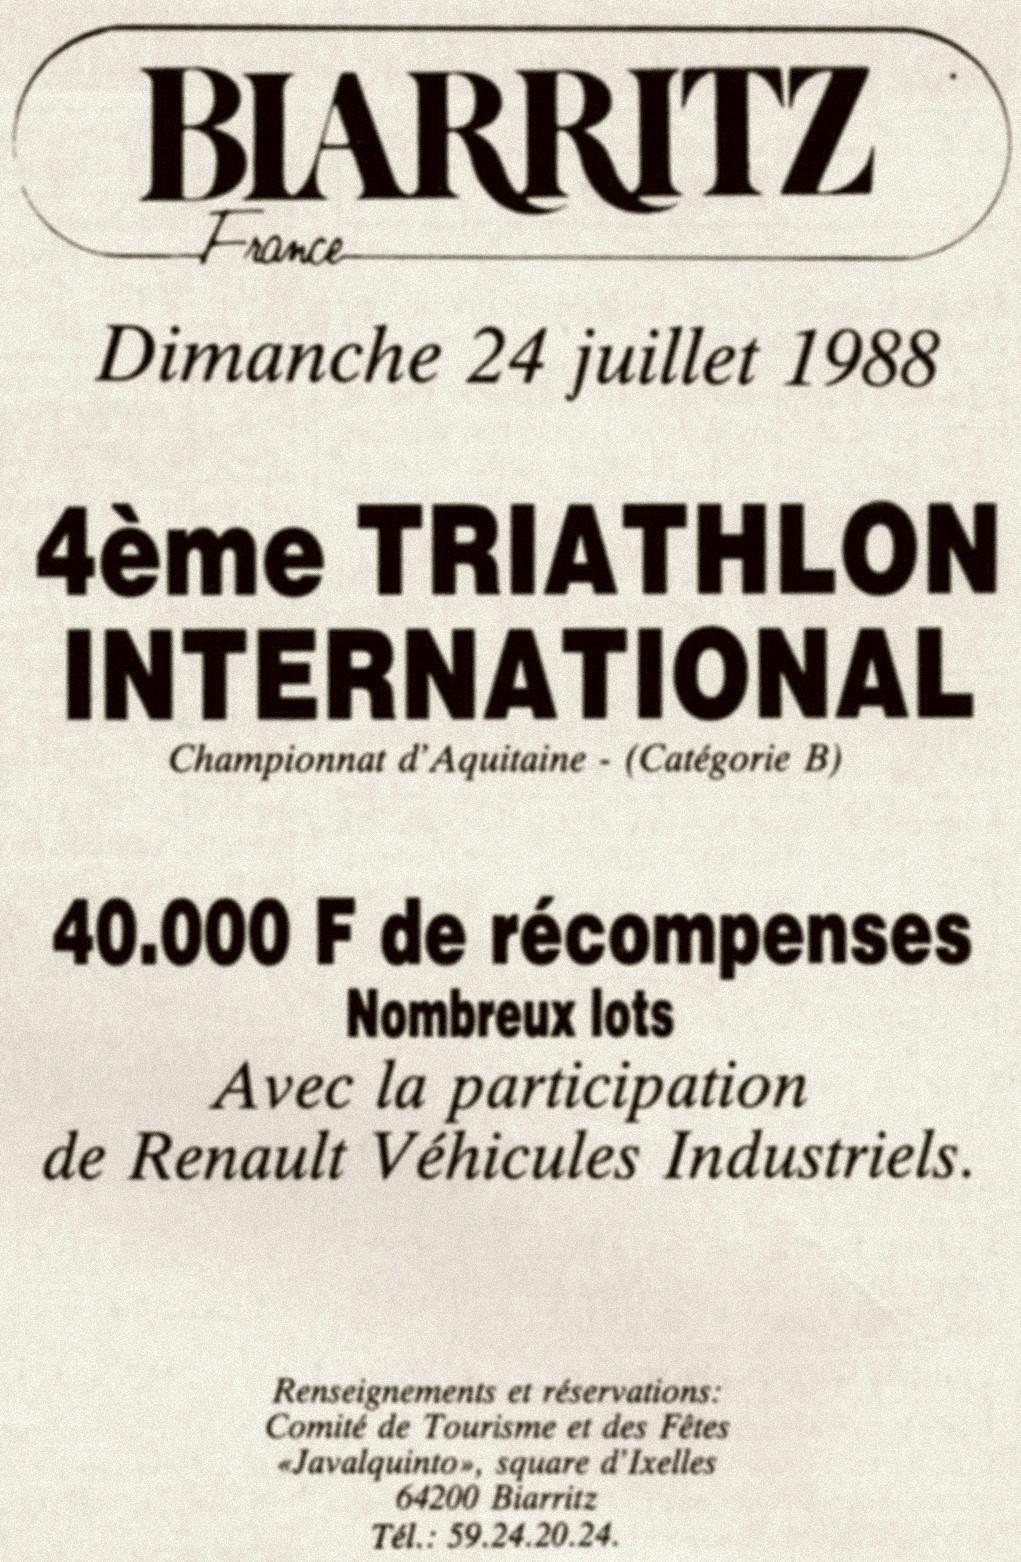 img966_biarritz_24-07-1988